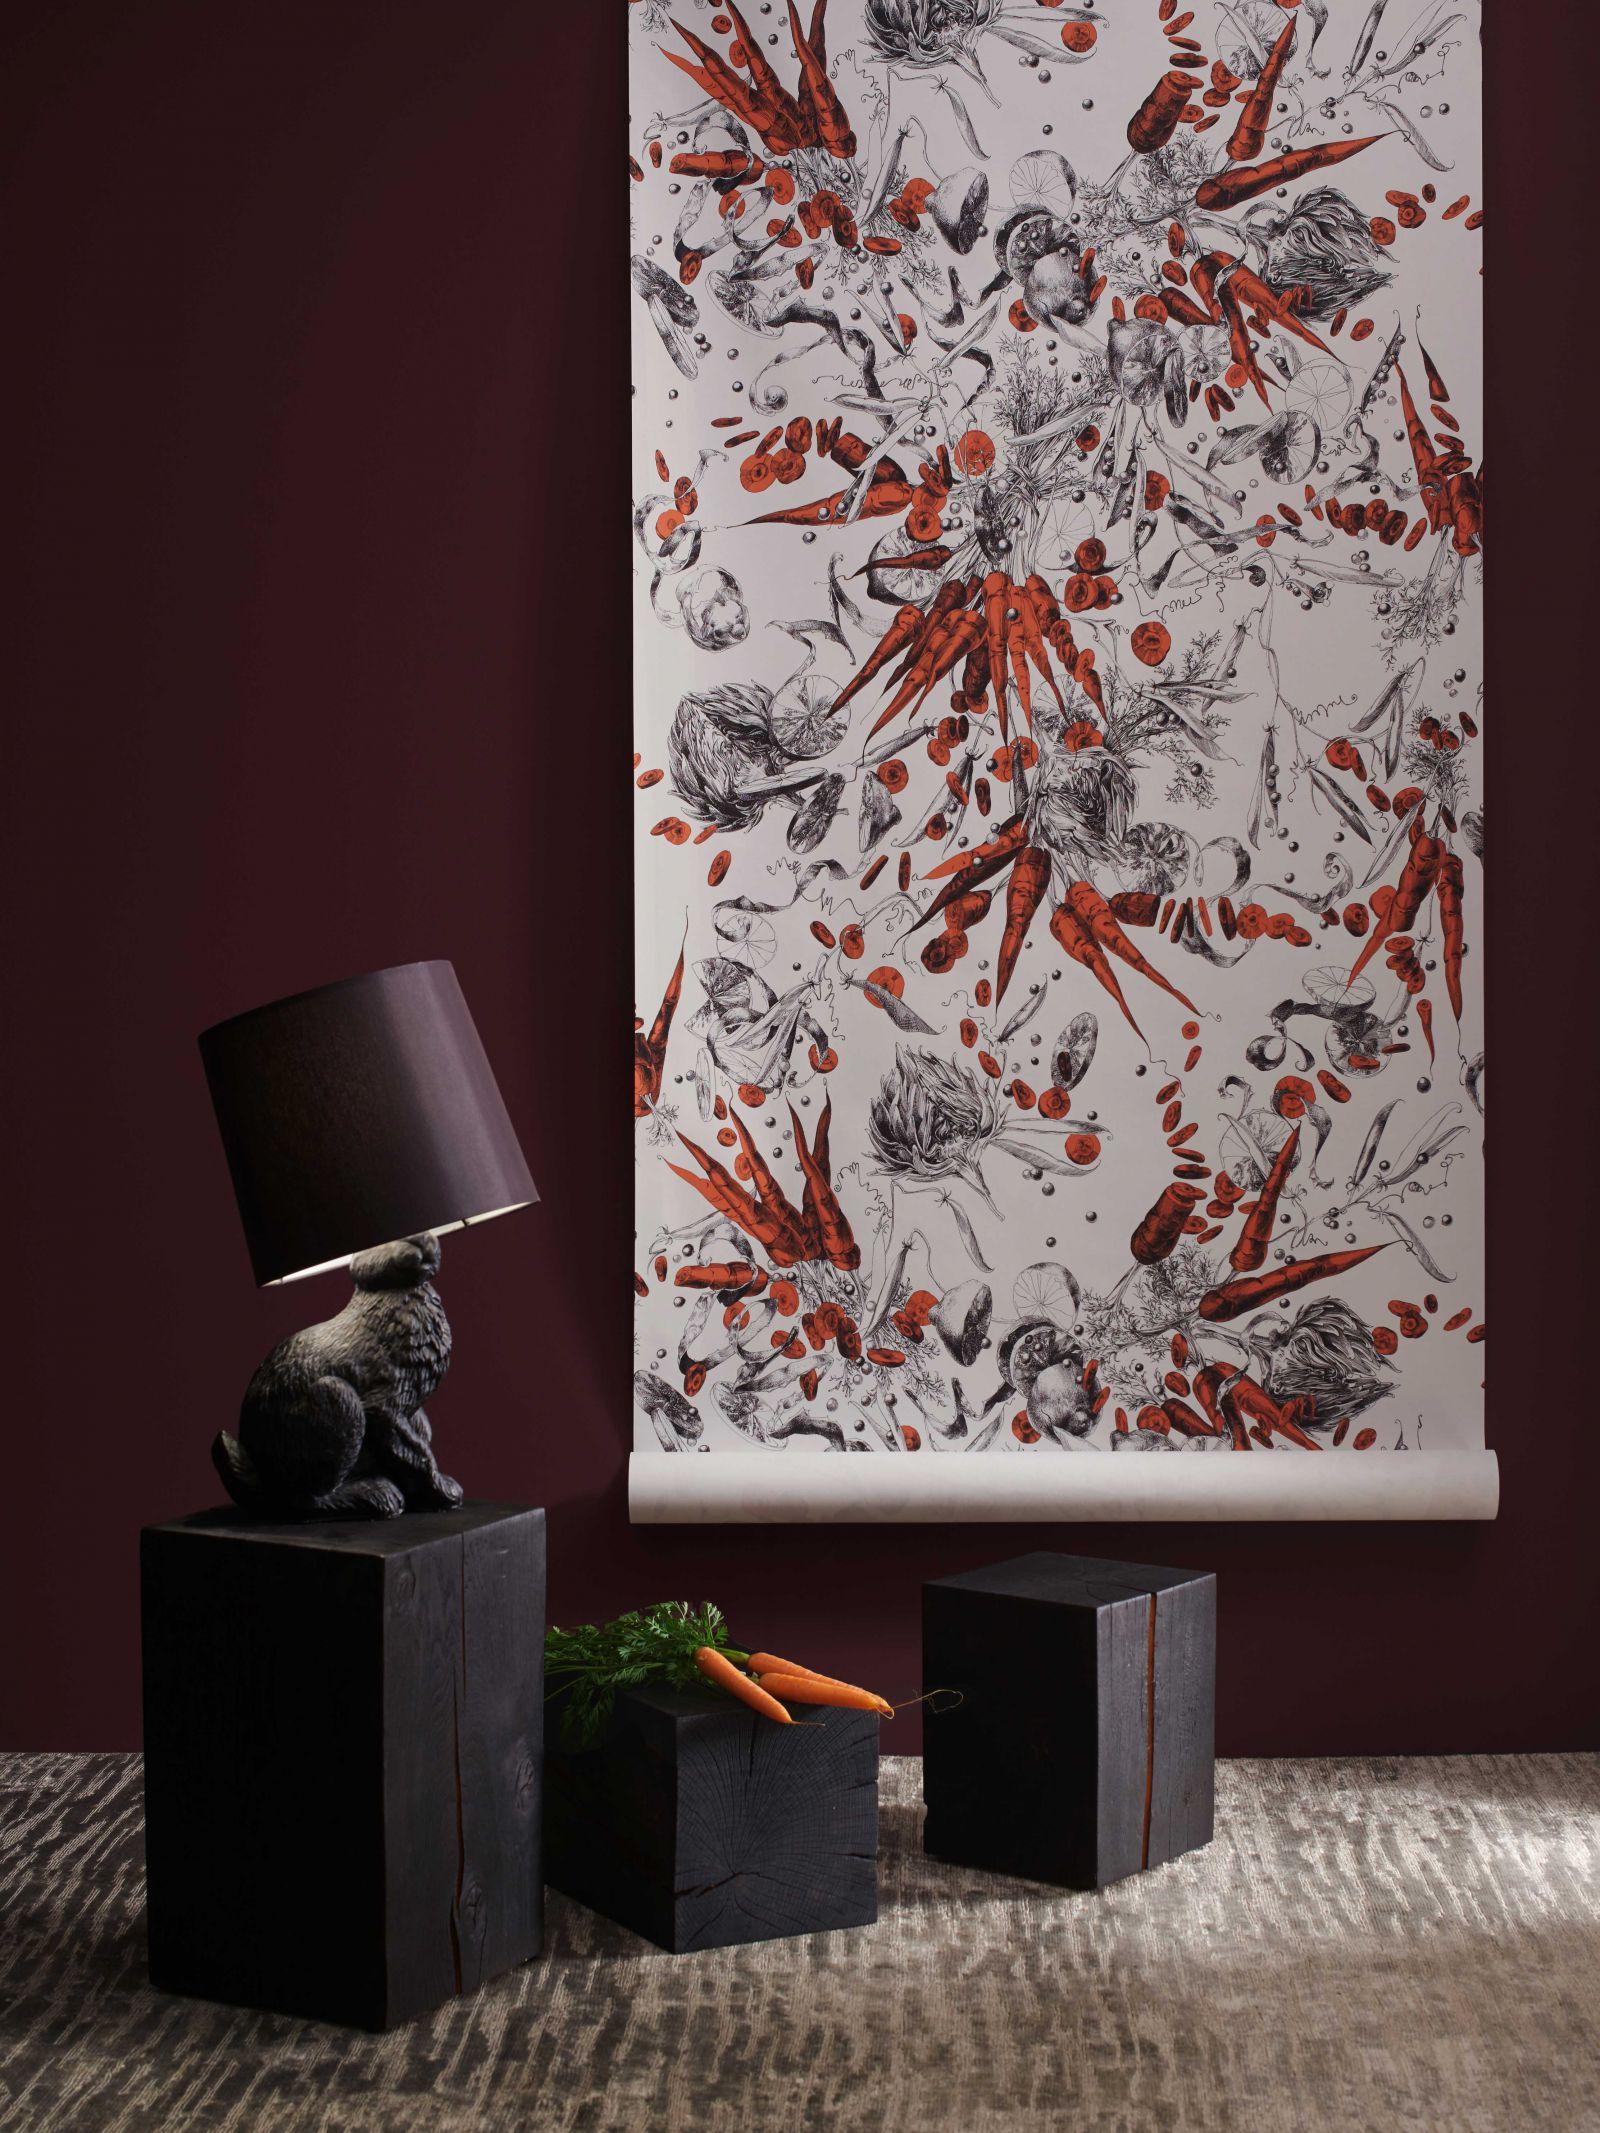 Paris Deco Off 2019 Paris Deco Off 2019 The Best of Upholstery Fabrics: Paris Deco Off 2019 The Best of Upholstery Fabrics Paris Deco Off 2019 2 1